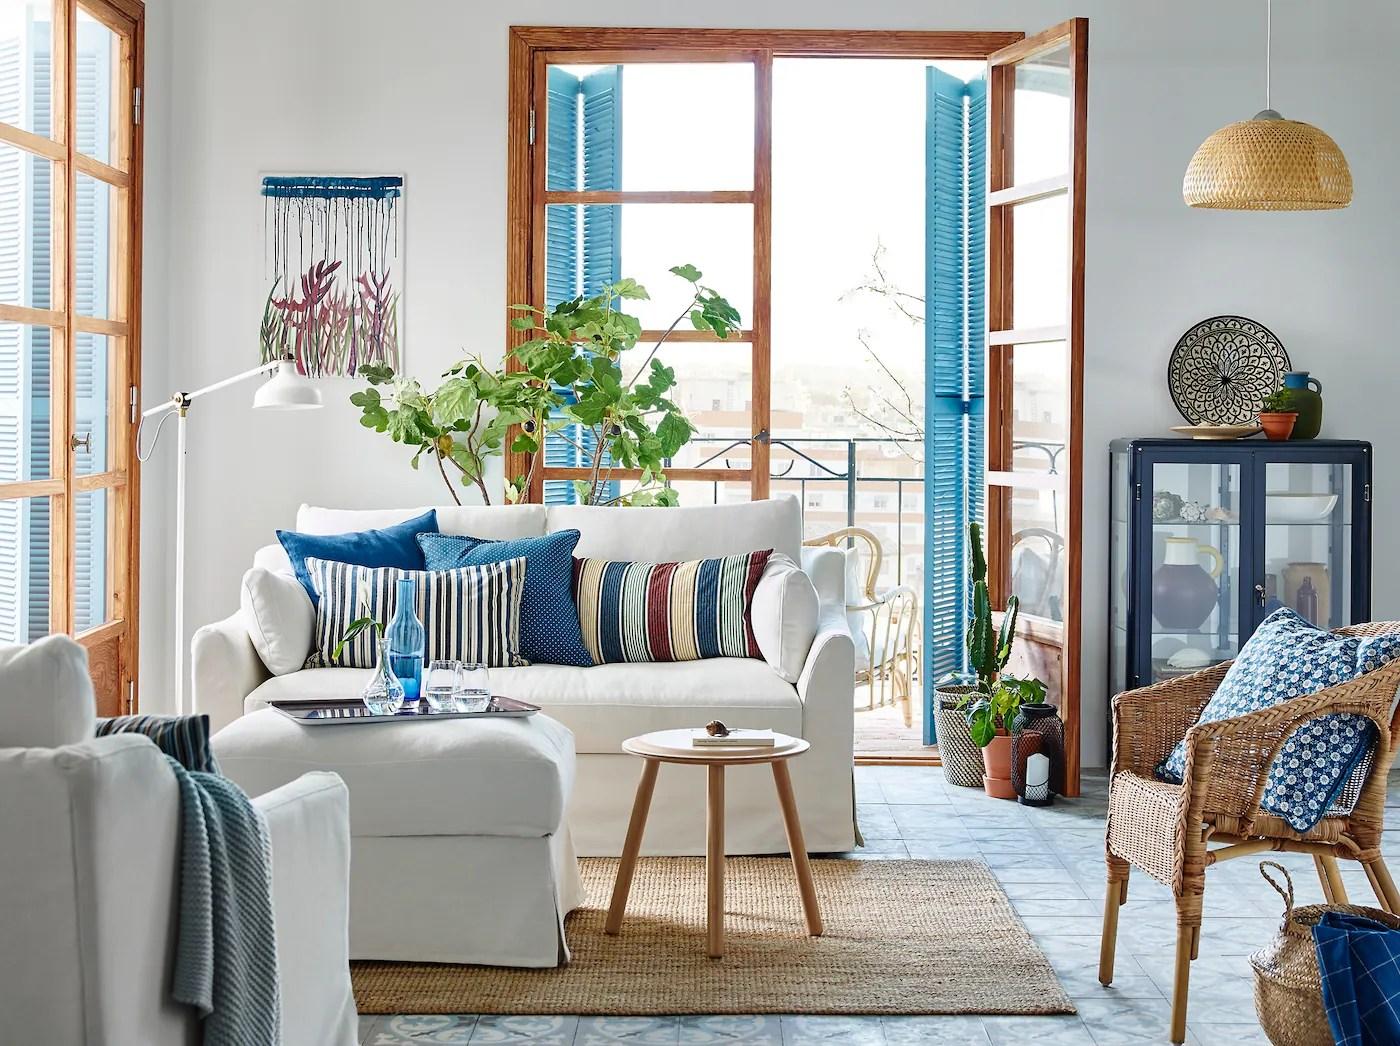 Living Room Design Ideas Gallery - IKEA